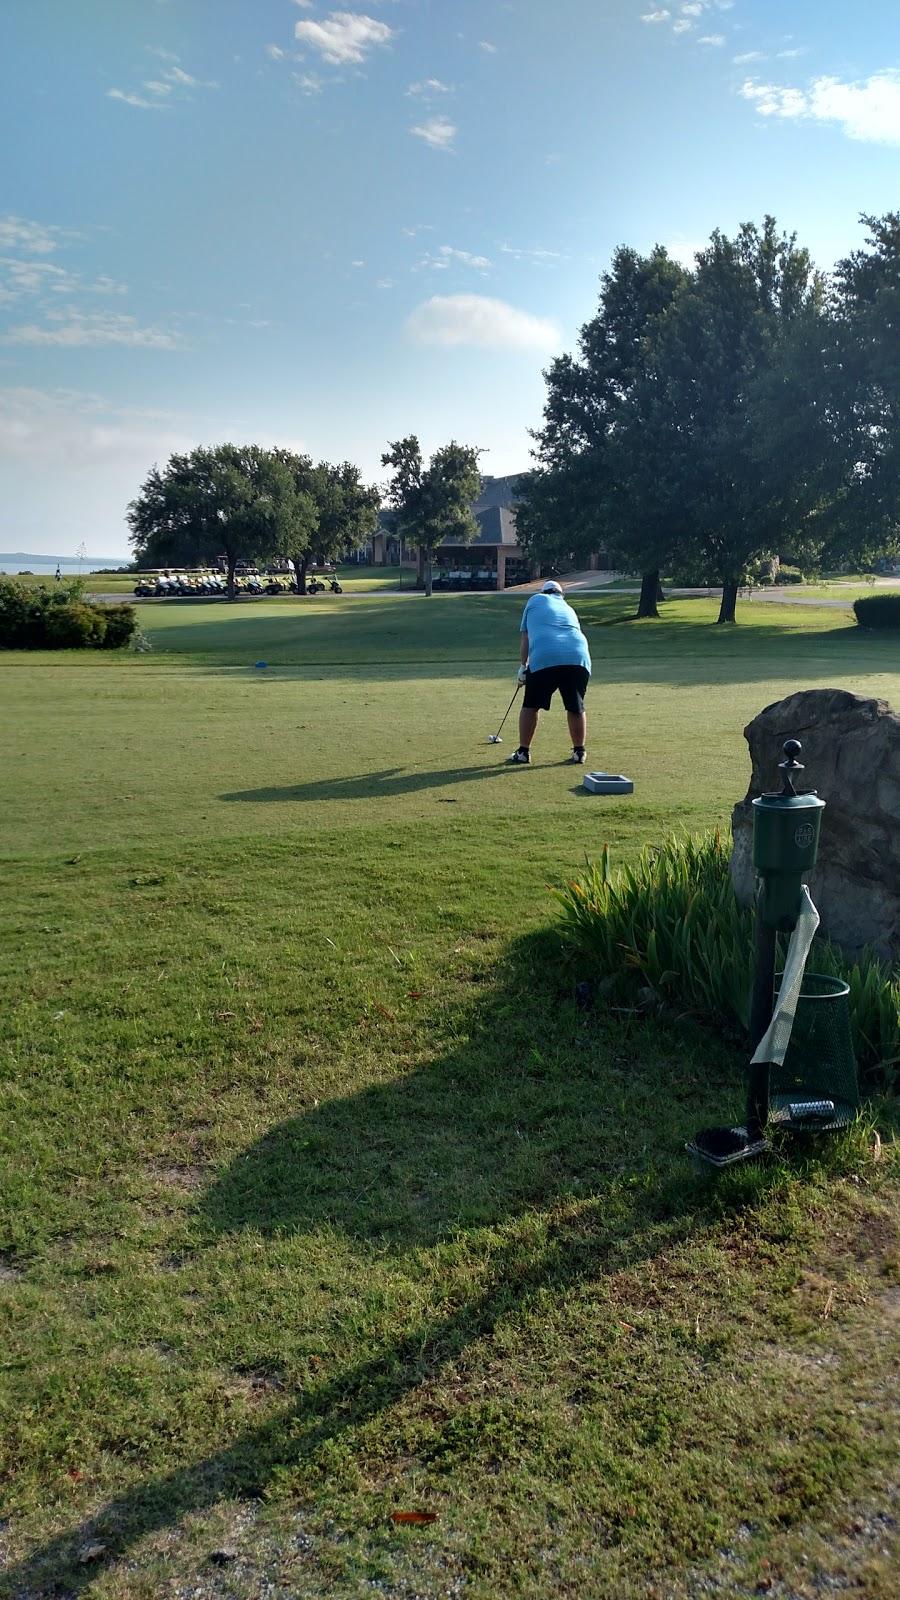 RB Golf Club and Resort - restaurant  | Photo 5 of 10 | Address: 400 Half Moon Way, Runaway Bay, TX 76426, USA | Phone: (940) 575-2225